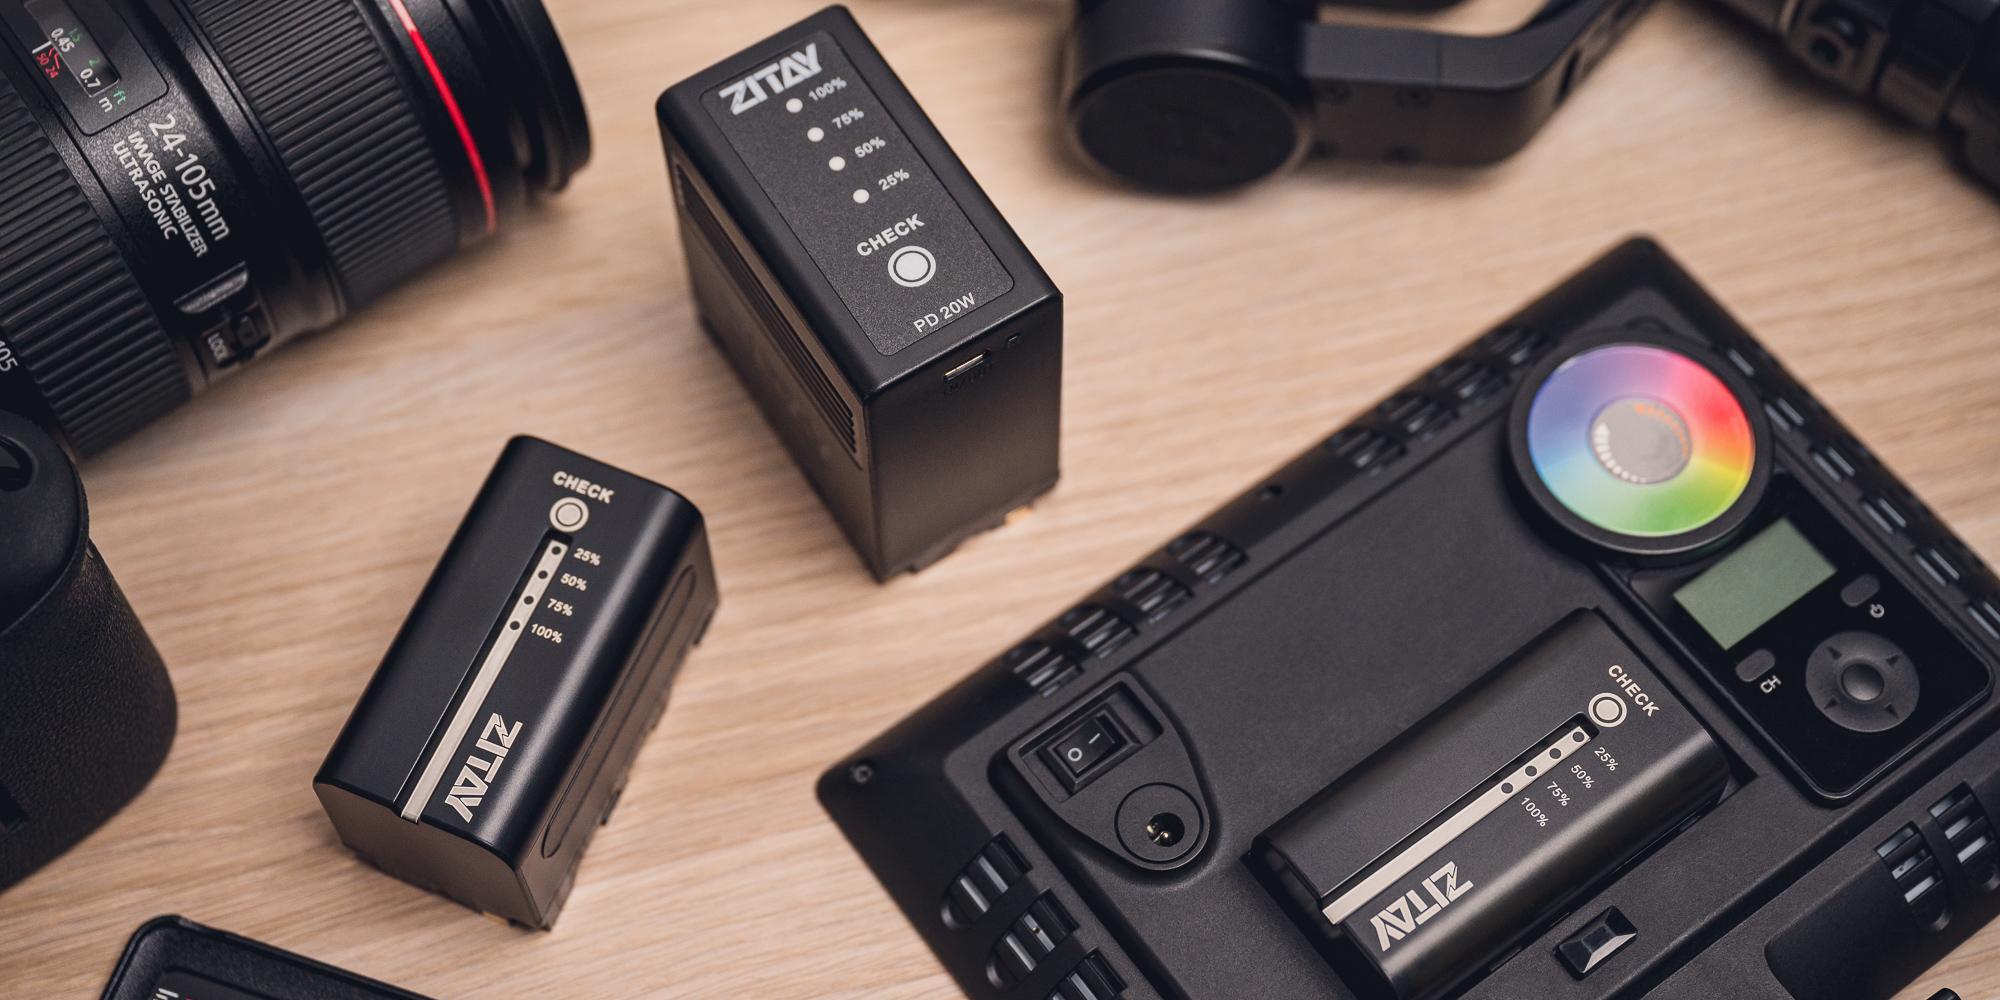 Akumulator Zitay zamiennik NP-F750 - Nowosczesna technologia